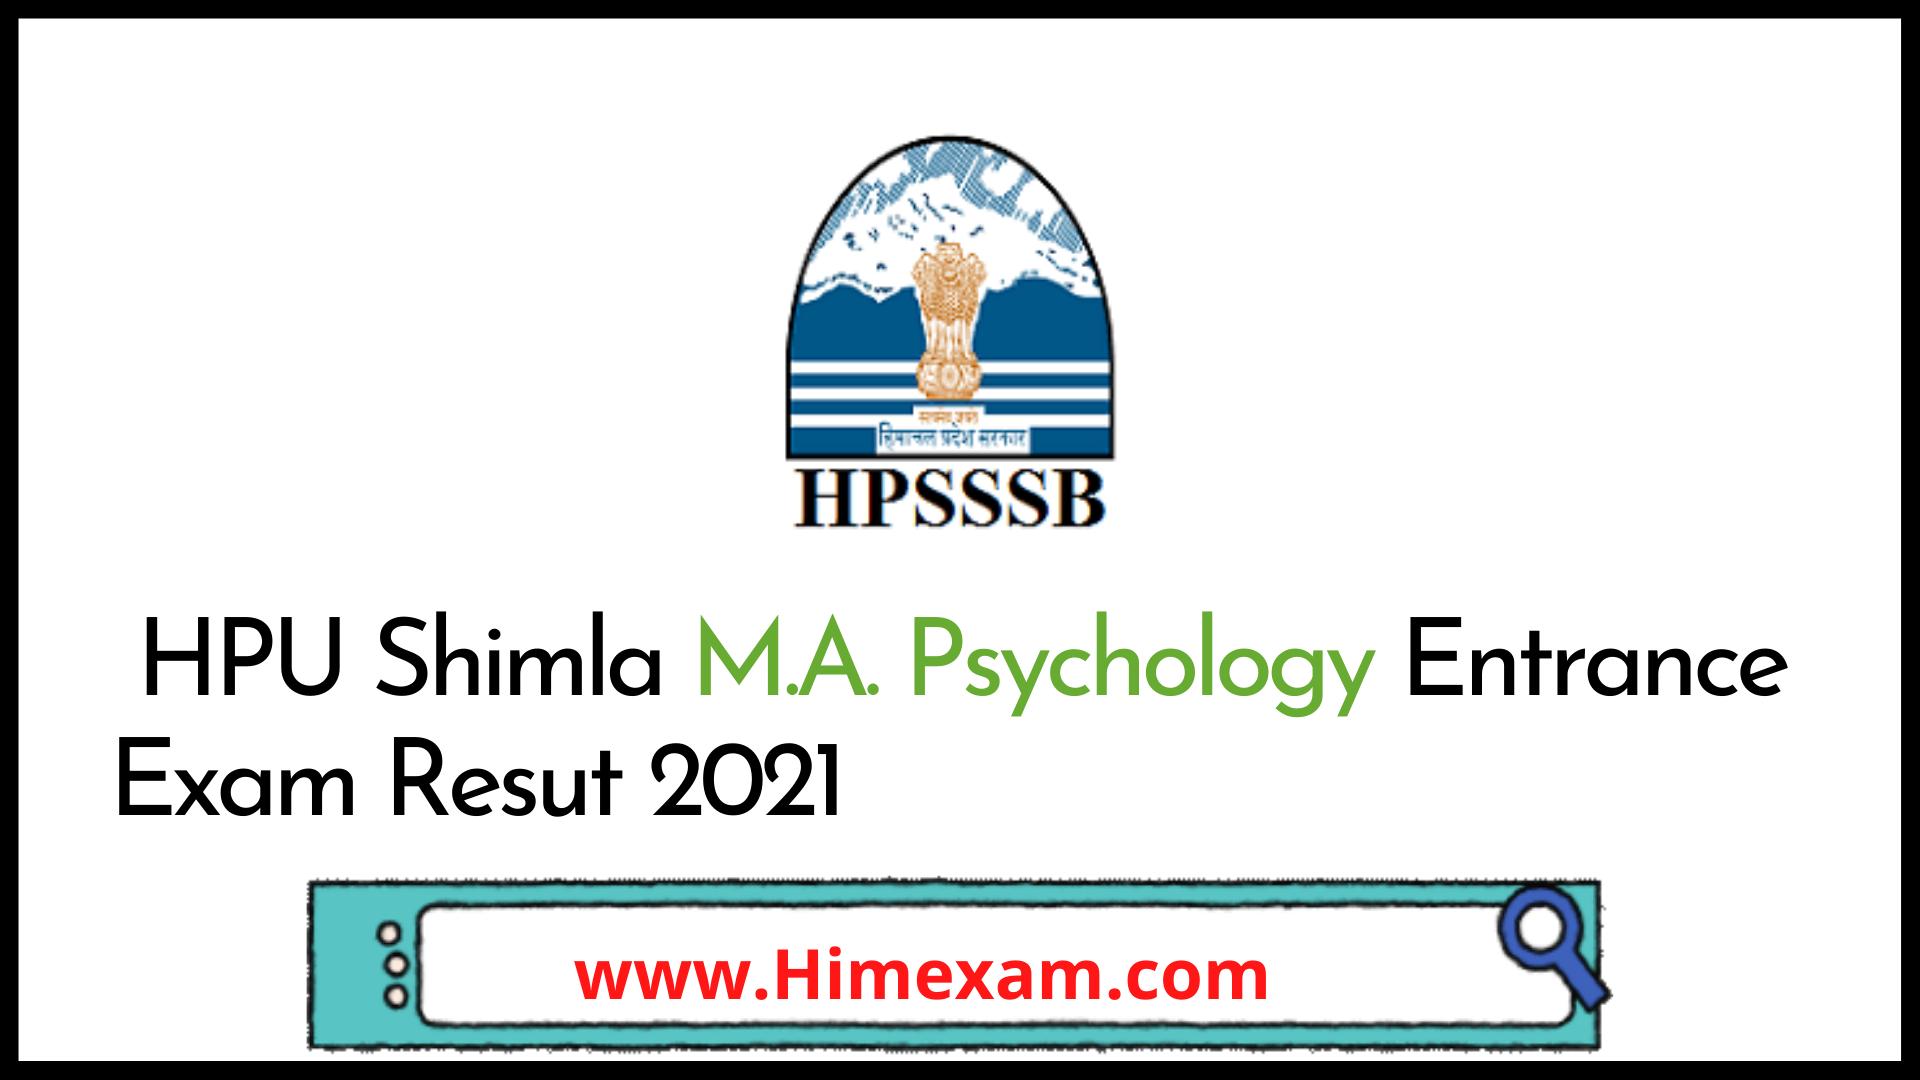 HPU Shimla M.A. Psychology Entrance Exam Resut 2021